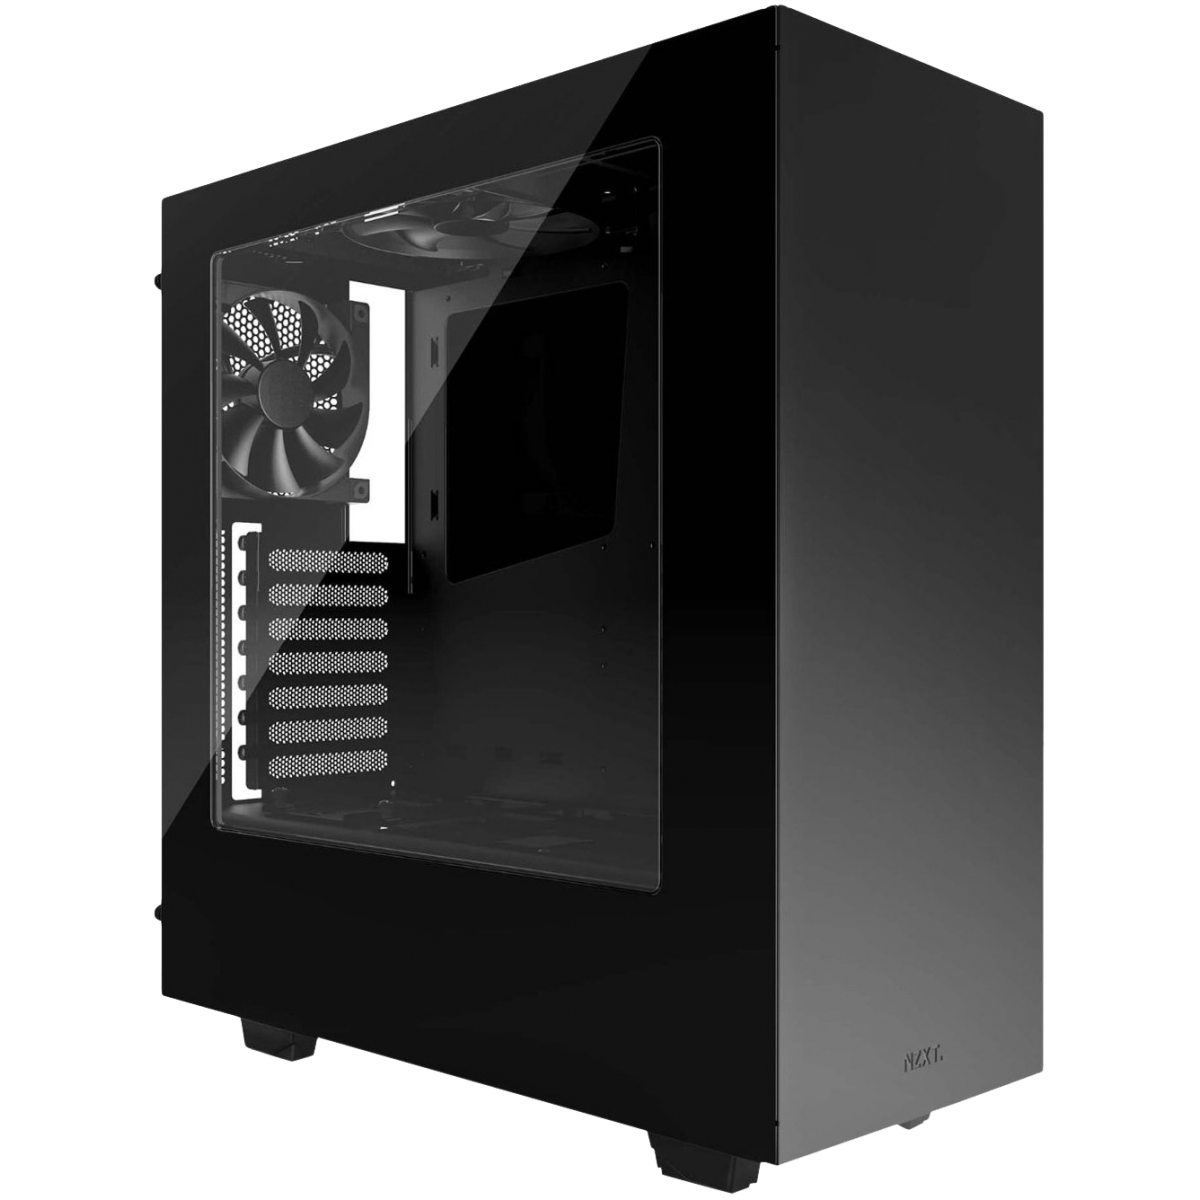 Gabinete Gamer NZXT S340, Mid Tower, Com 2 Fans, Vidro Temperado, Black, Sem Fonte, CA-S340W-B1